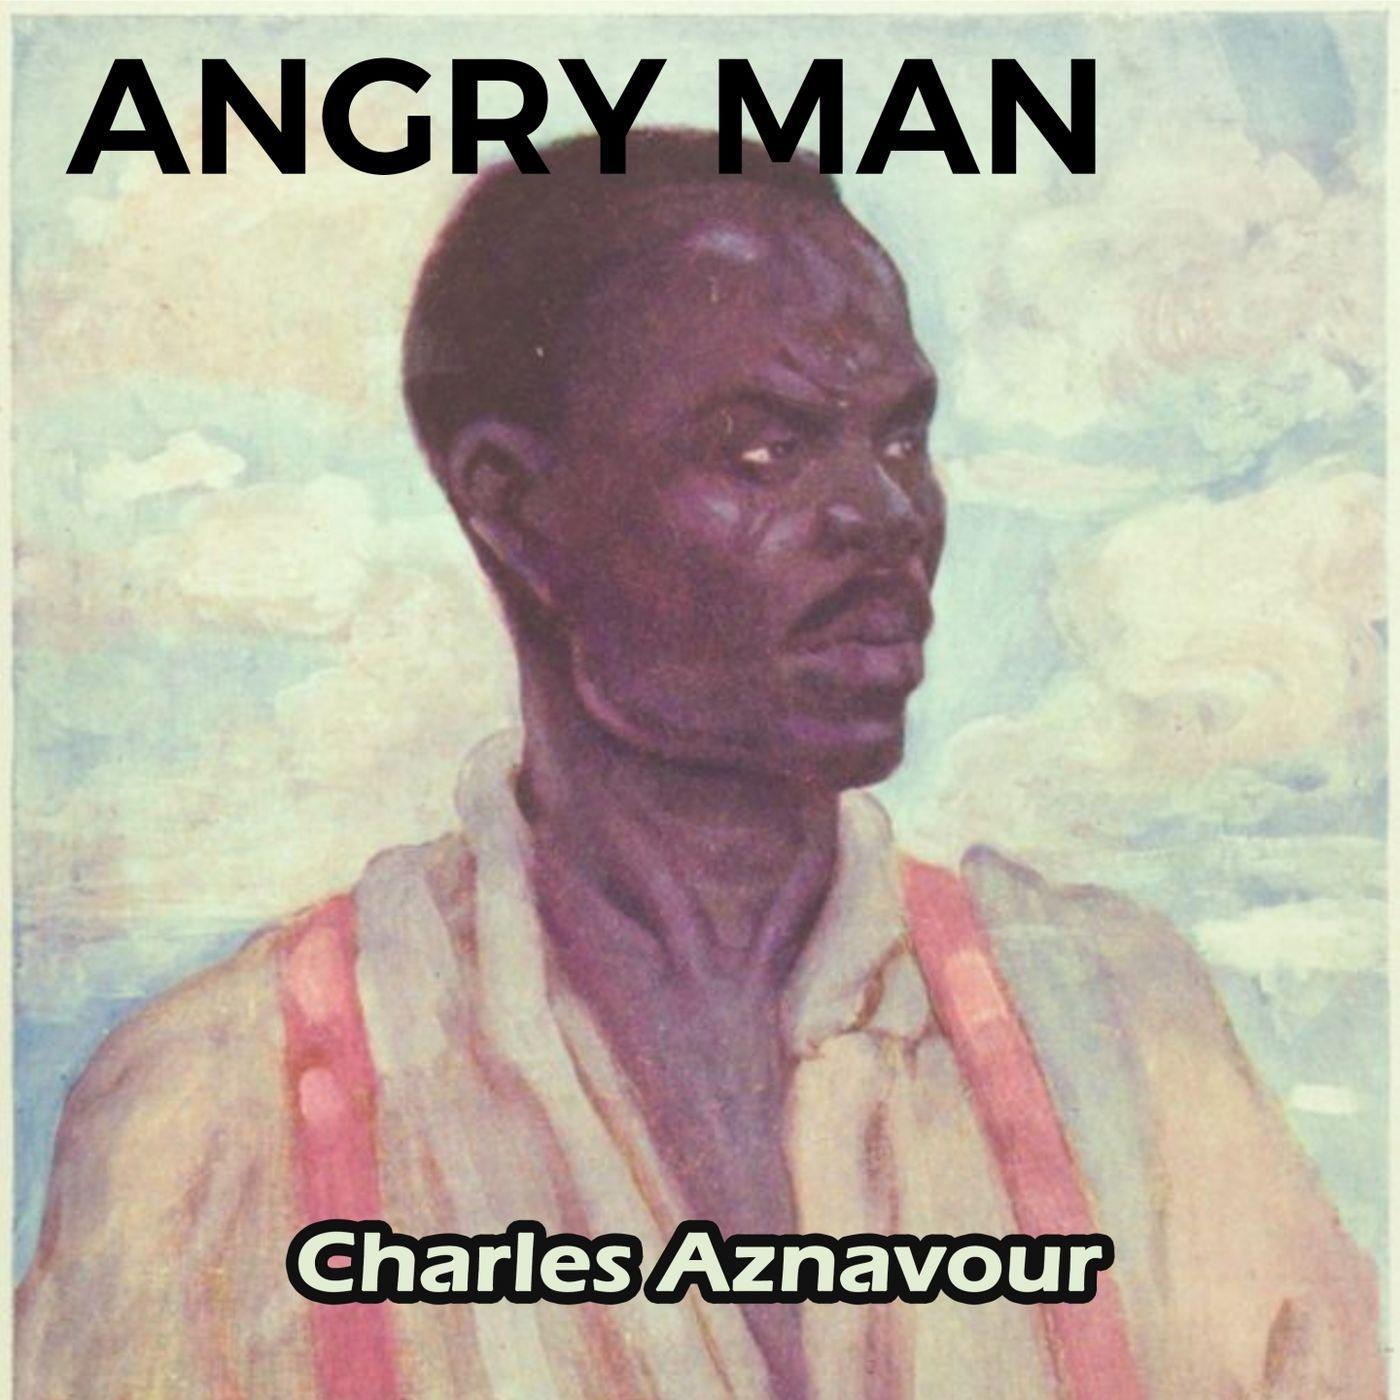 Artist:Charles Aznavour /Album:Angry Man /